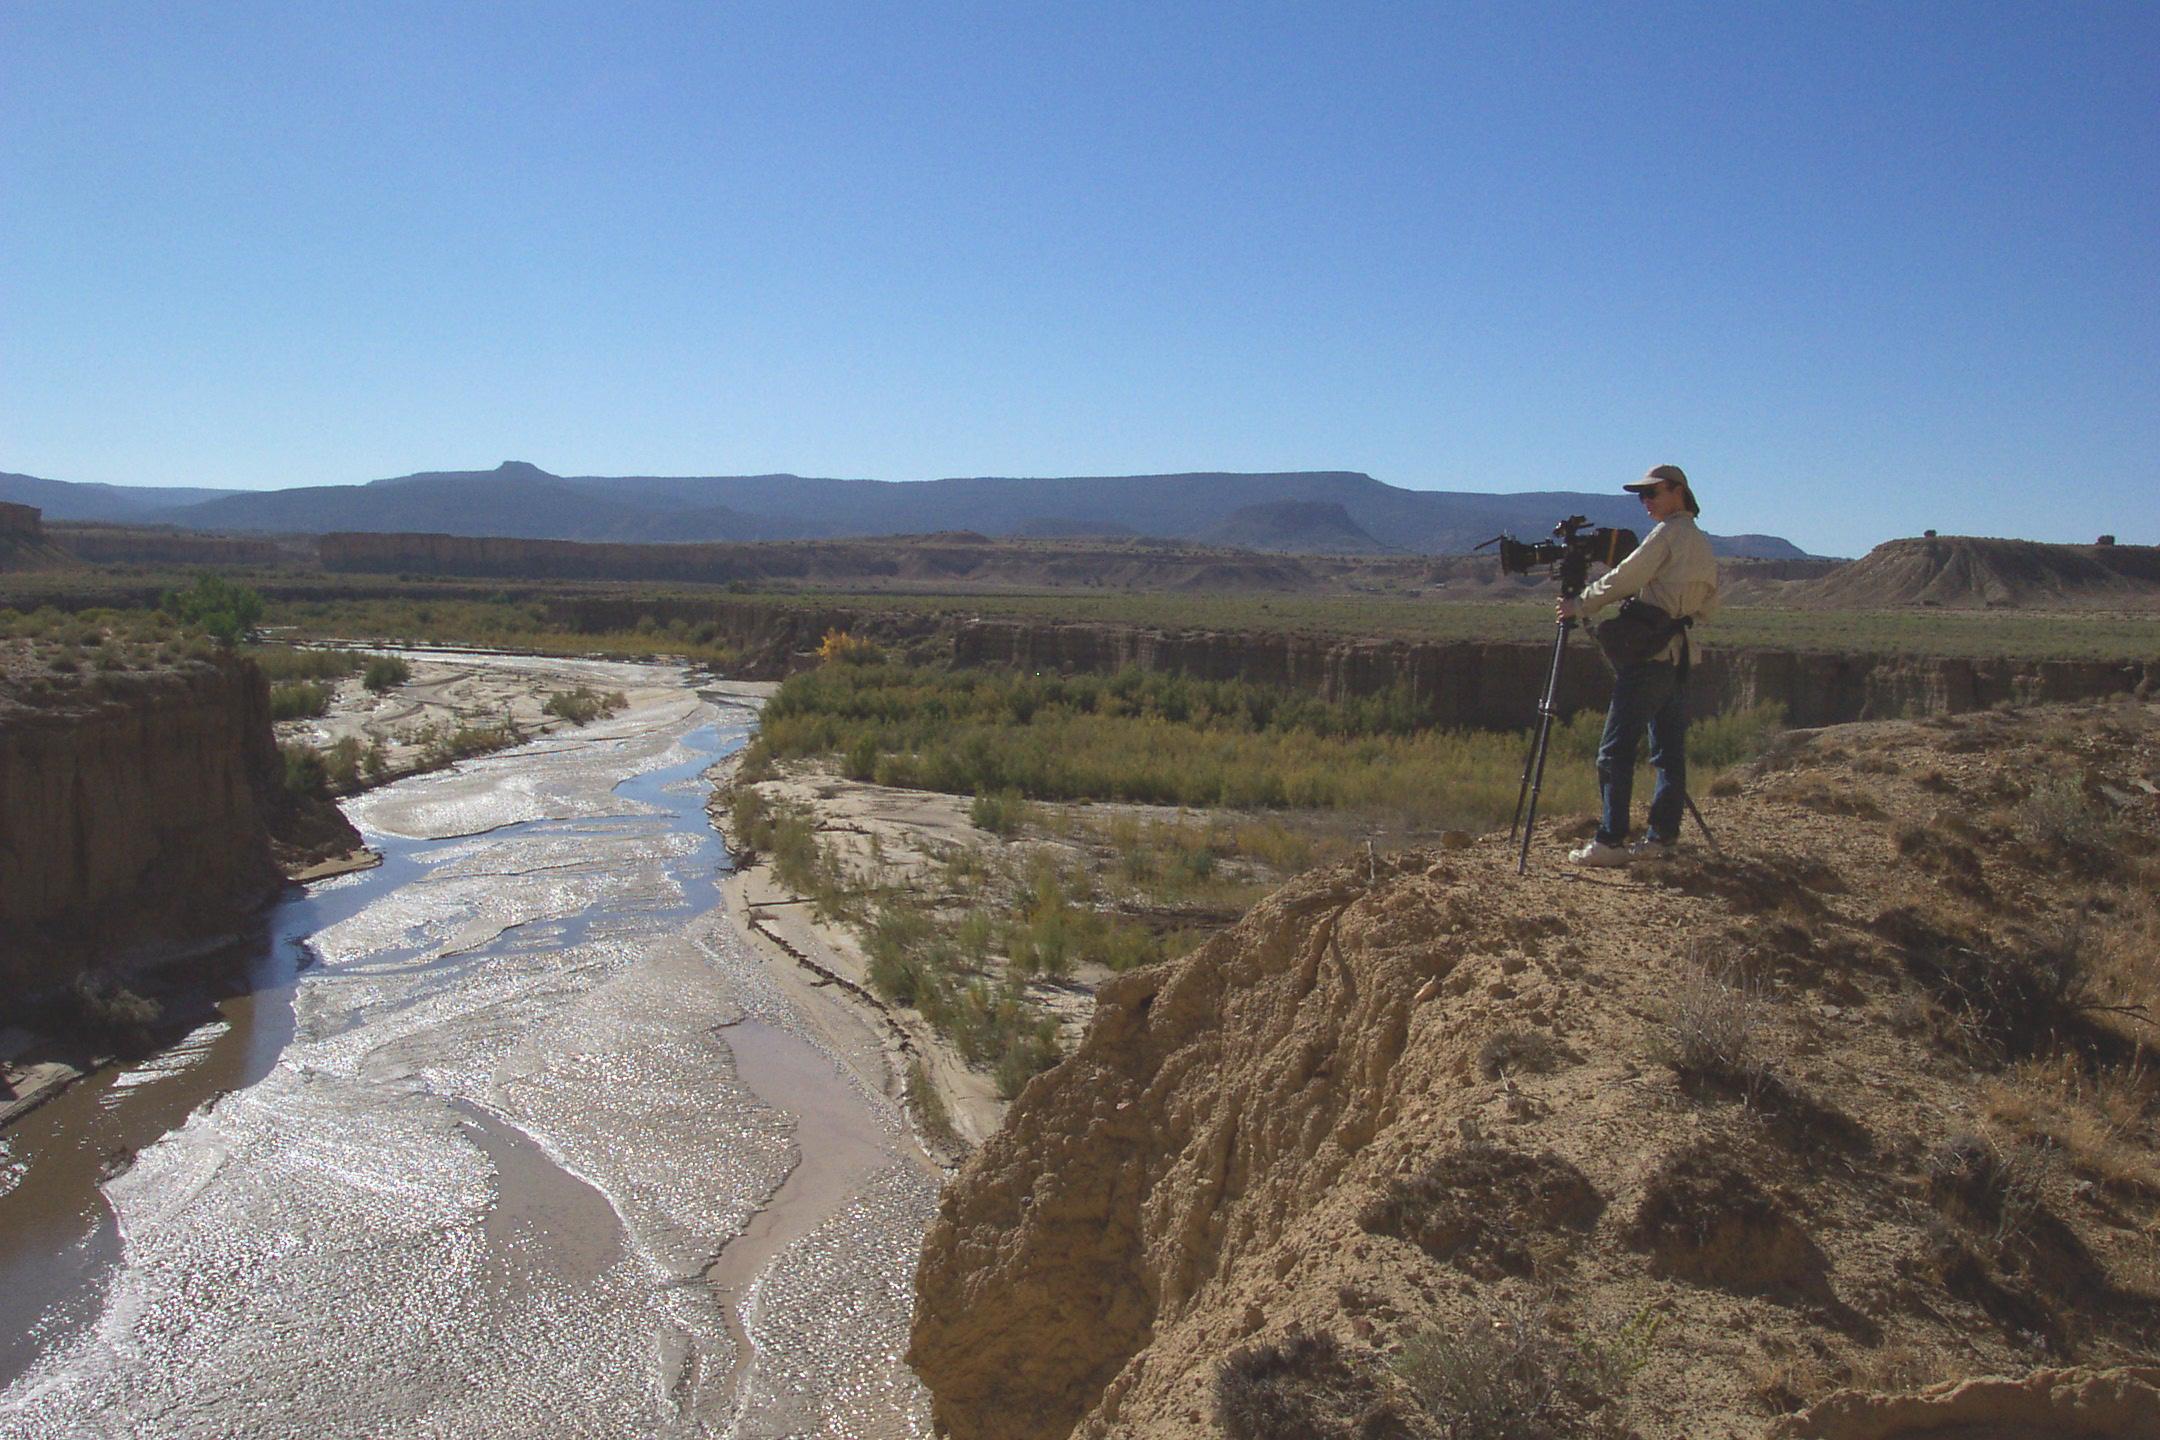 Rio Puerco